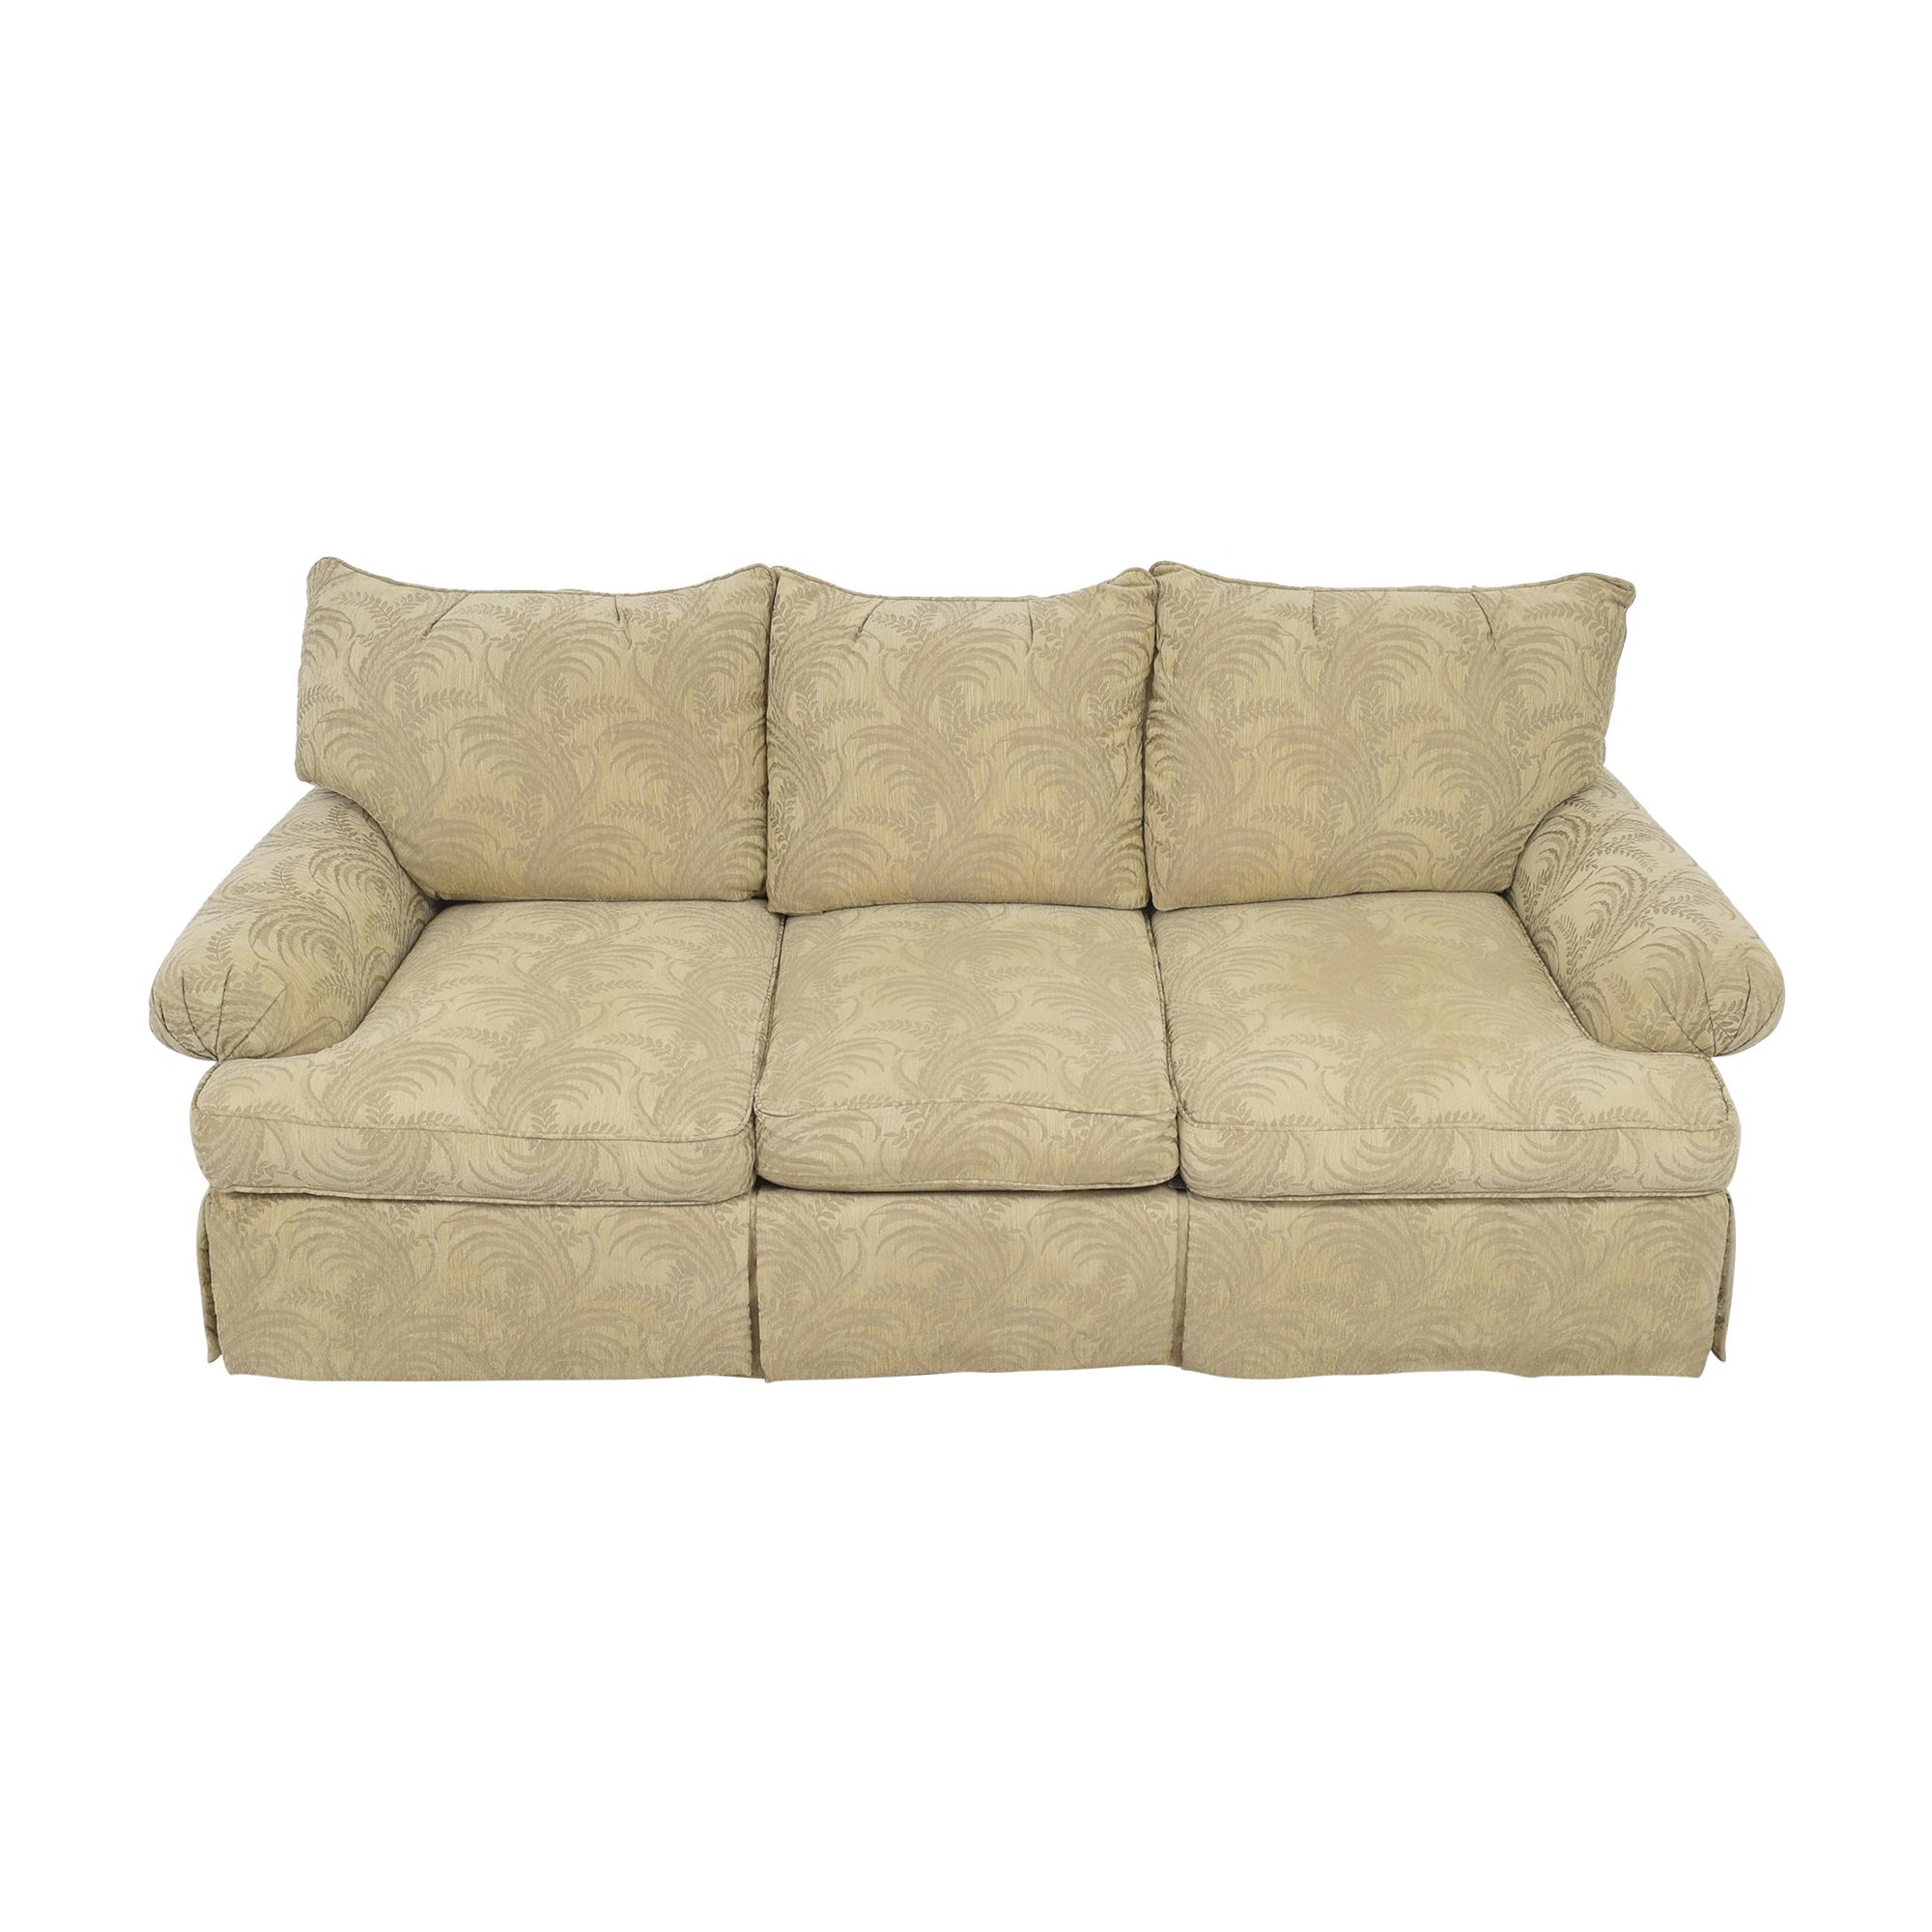 Bernhardt Roll Arm Three Cushion Sofa sale